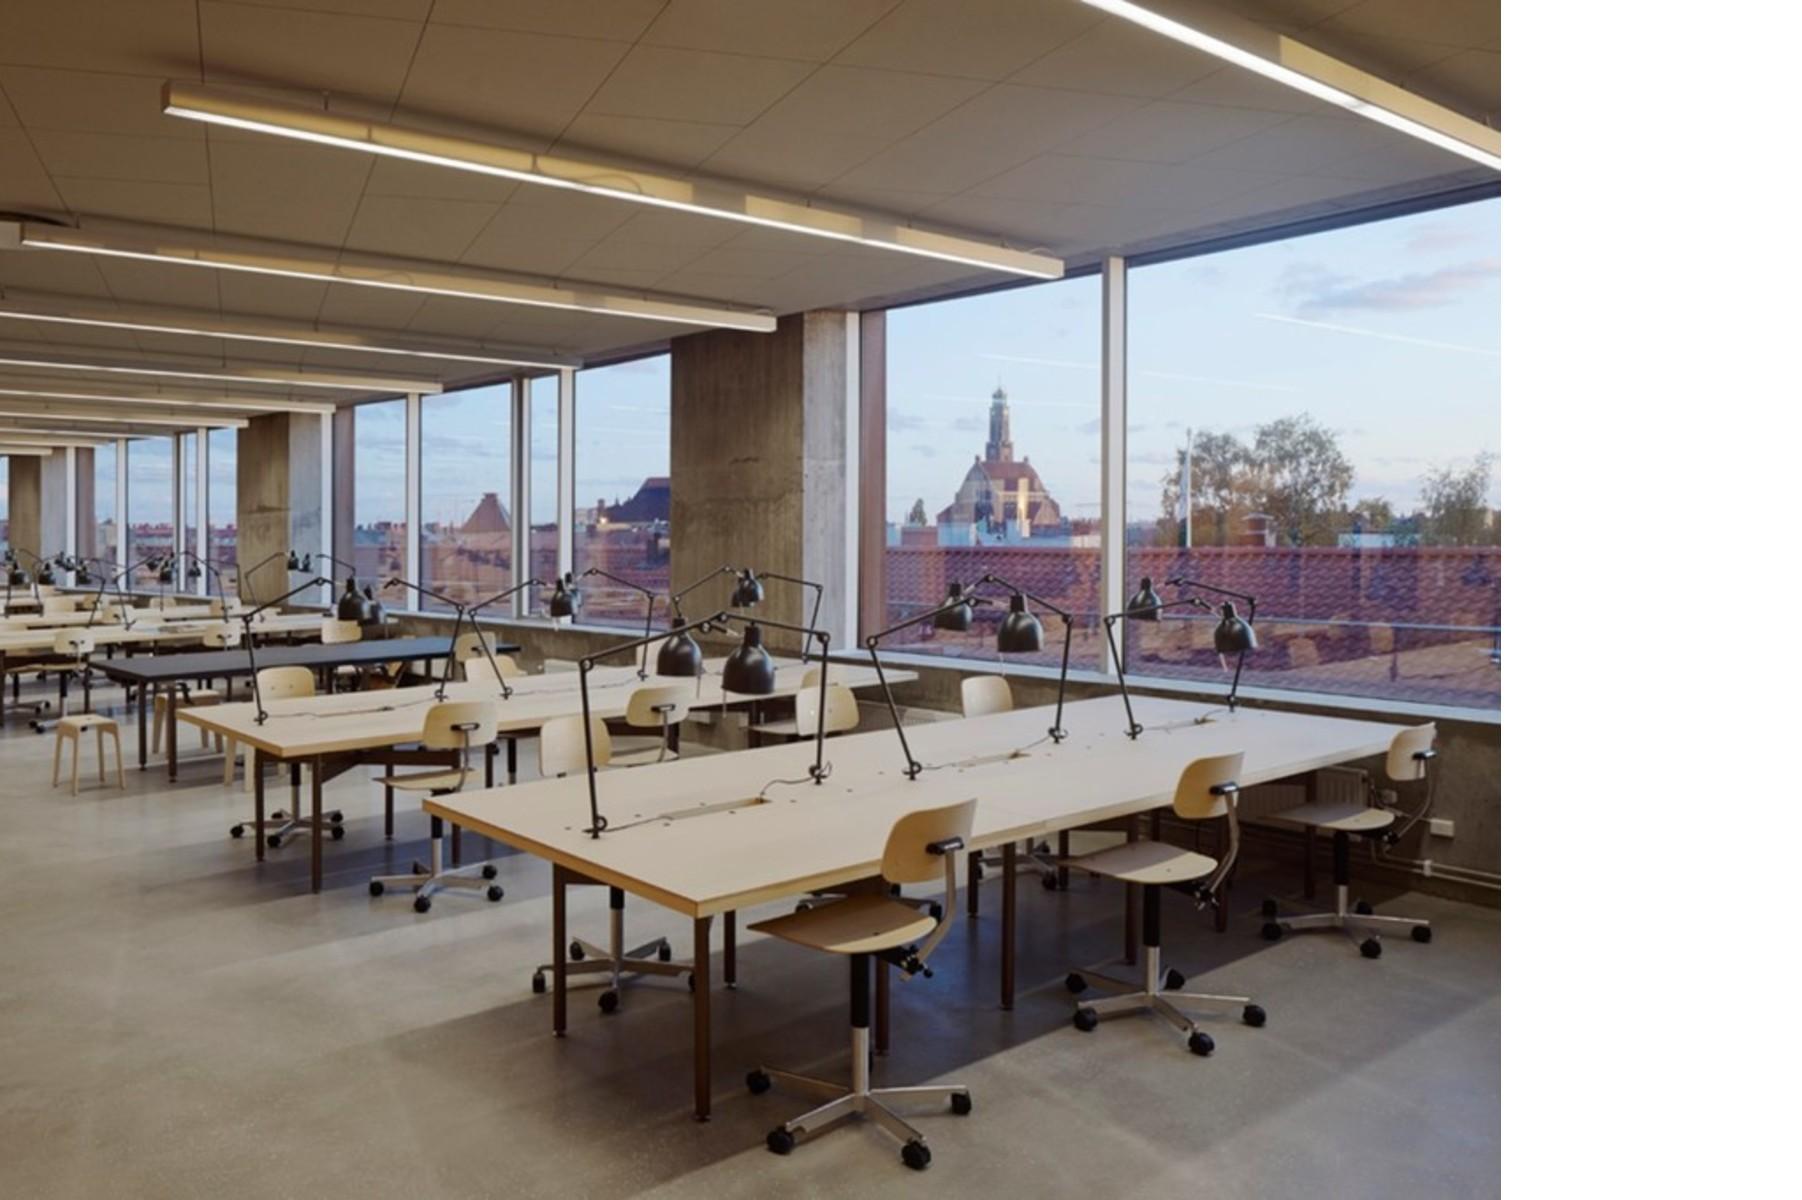 Tham Videgard Design The New Stockholm School Of Architecture Floornature,Two Car Garage Interior Design Ideas